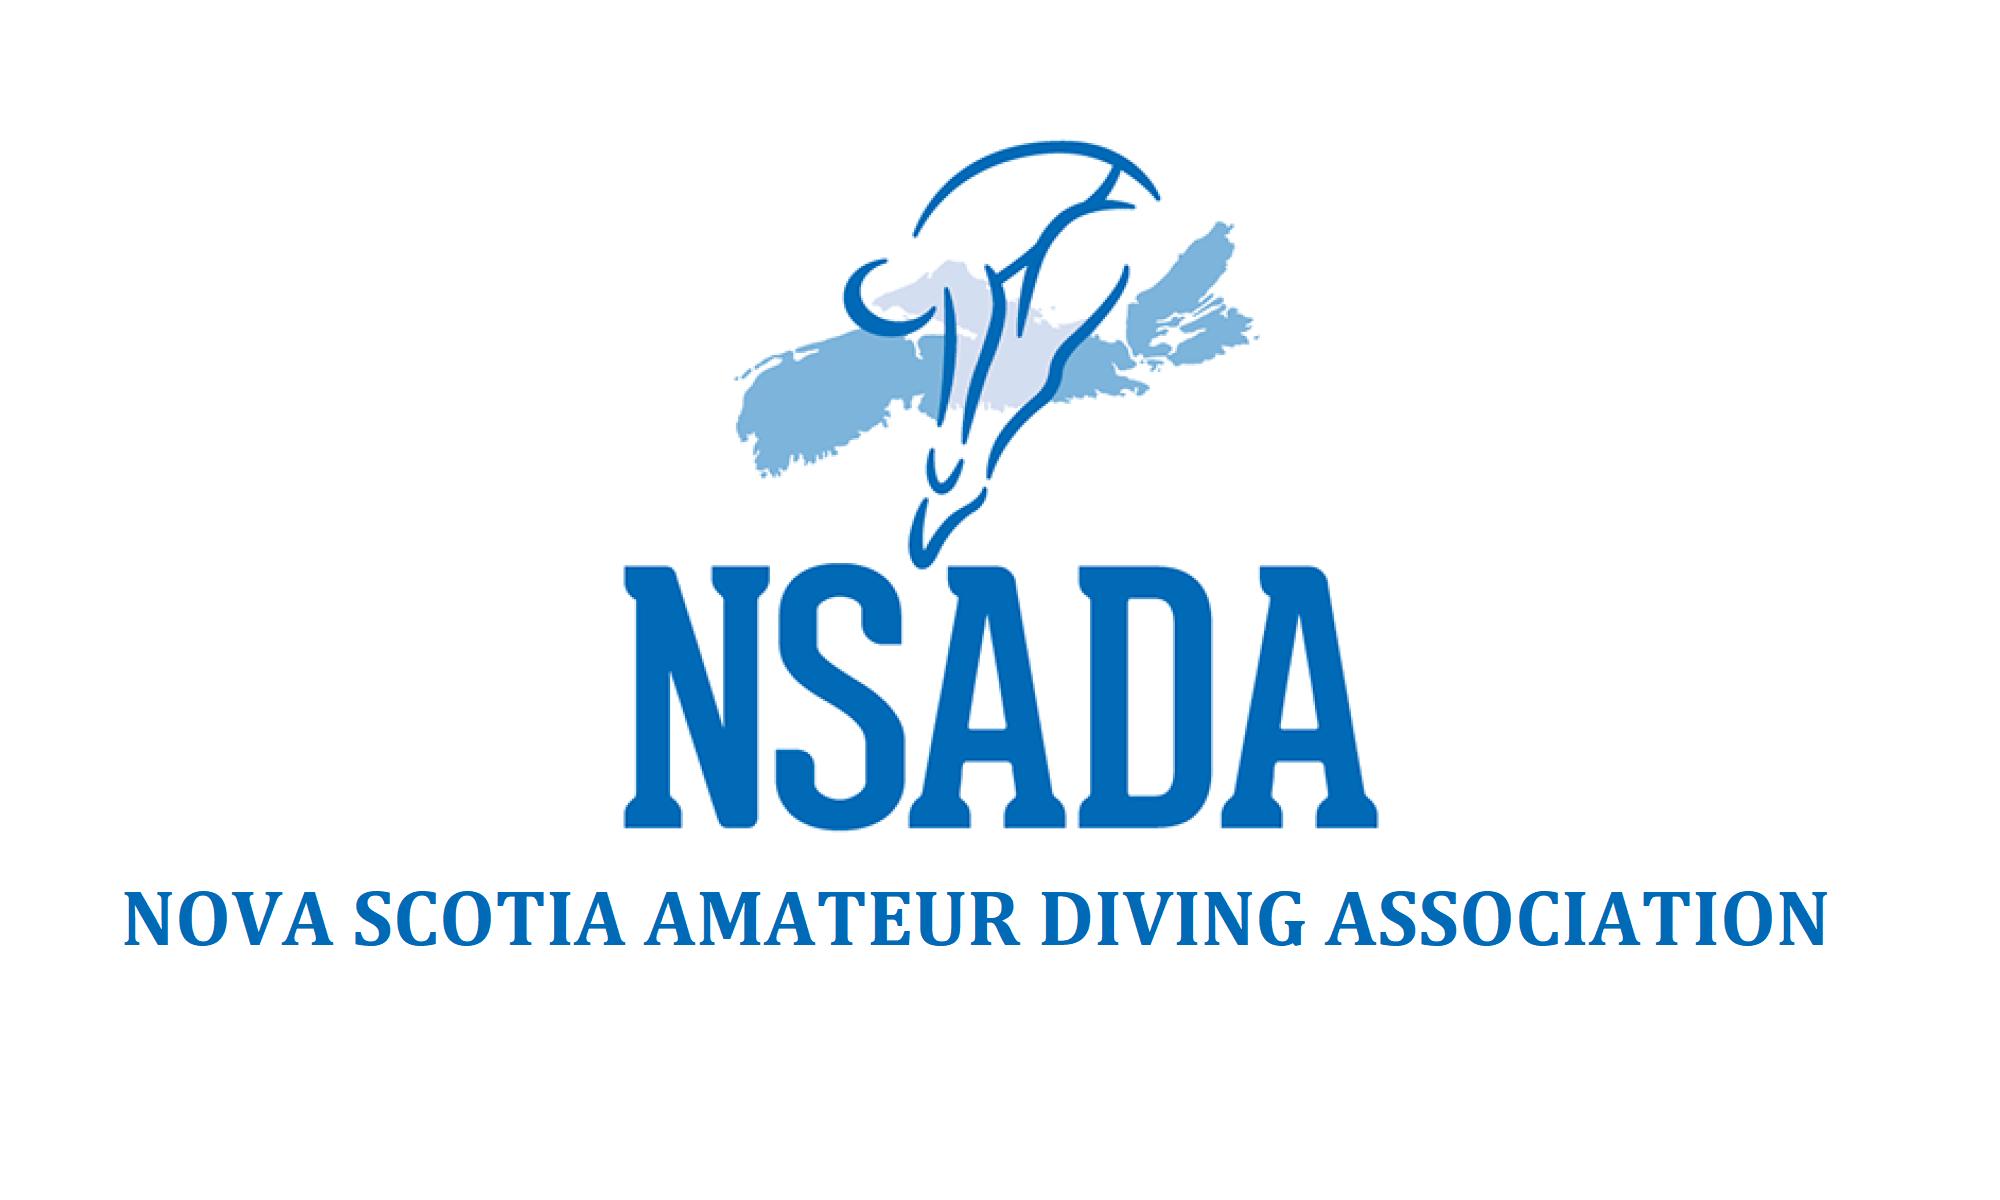 Nova Scotia Amateur Diving Association